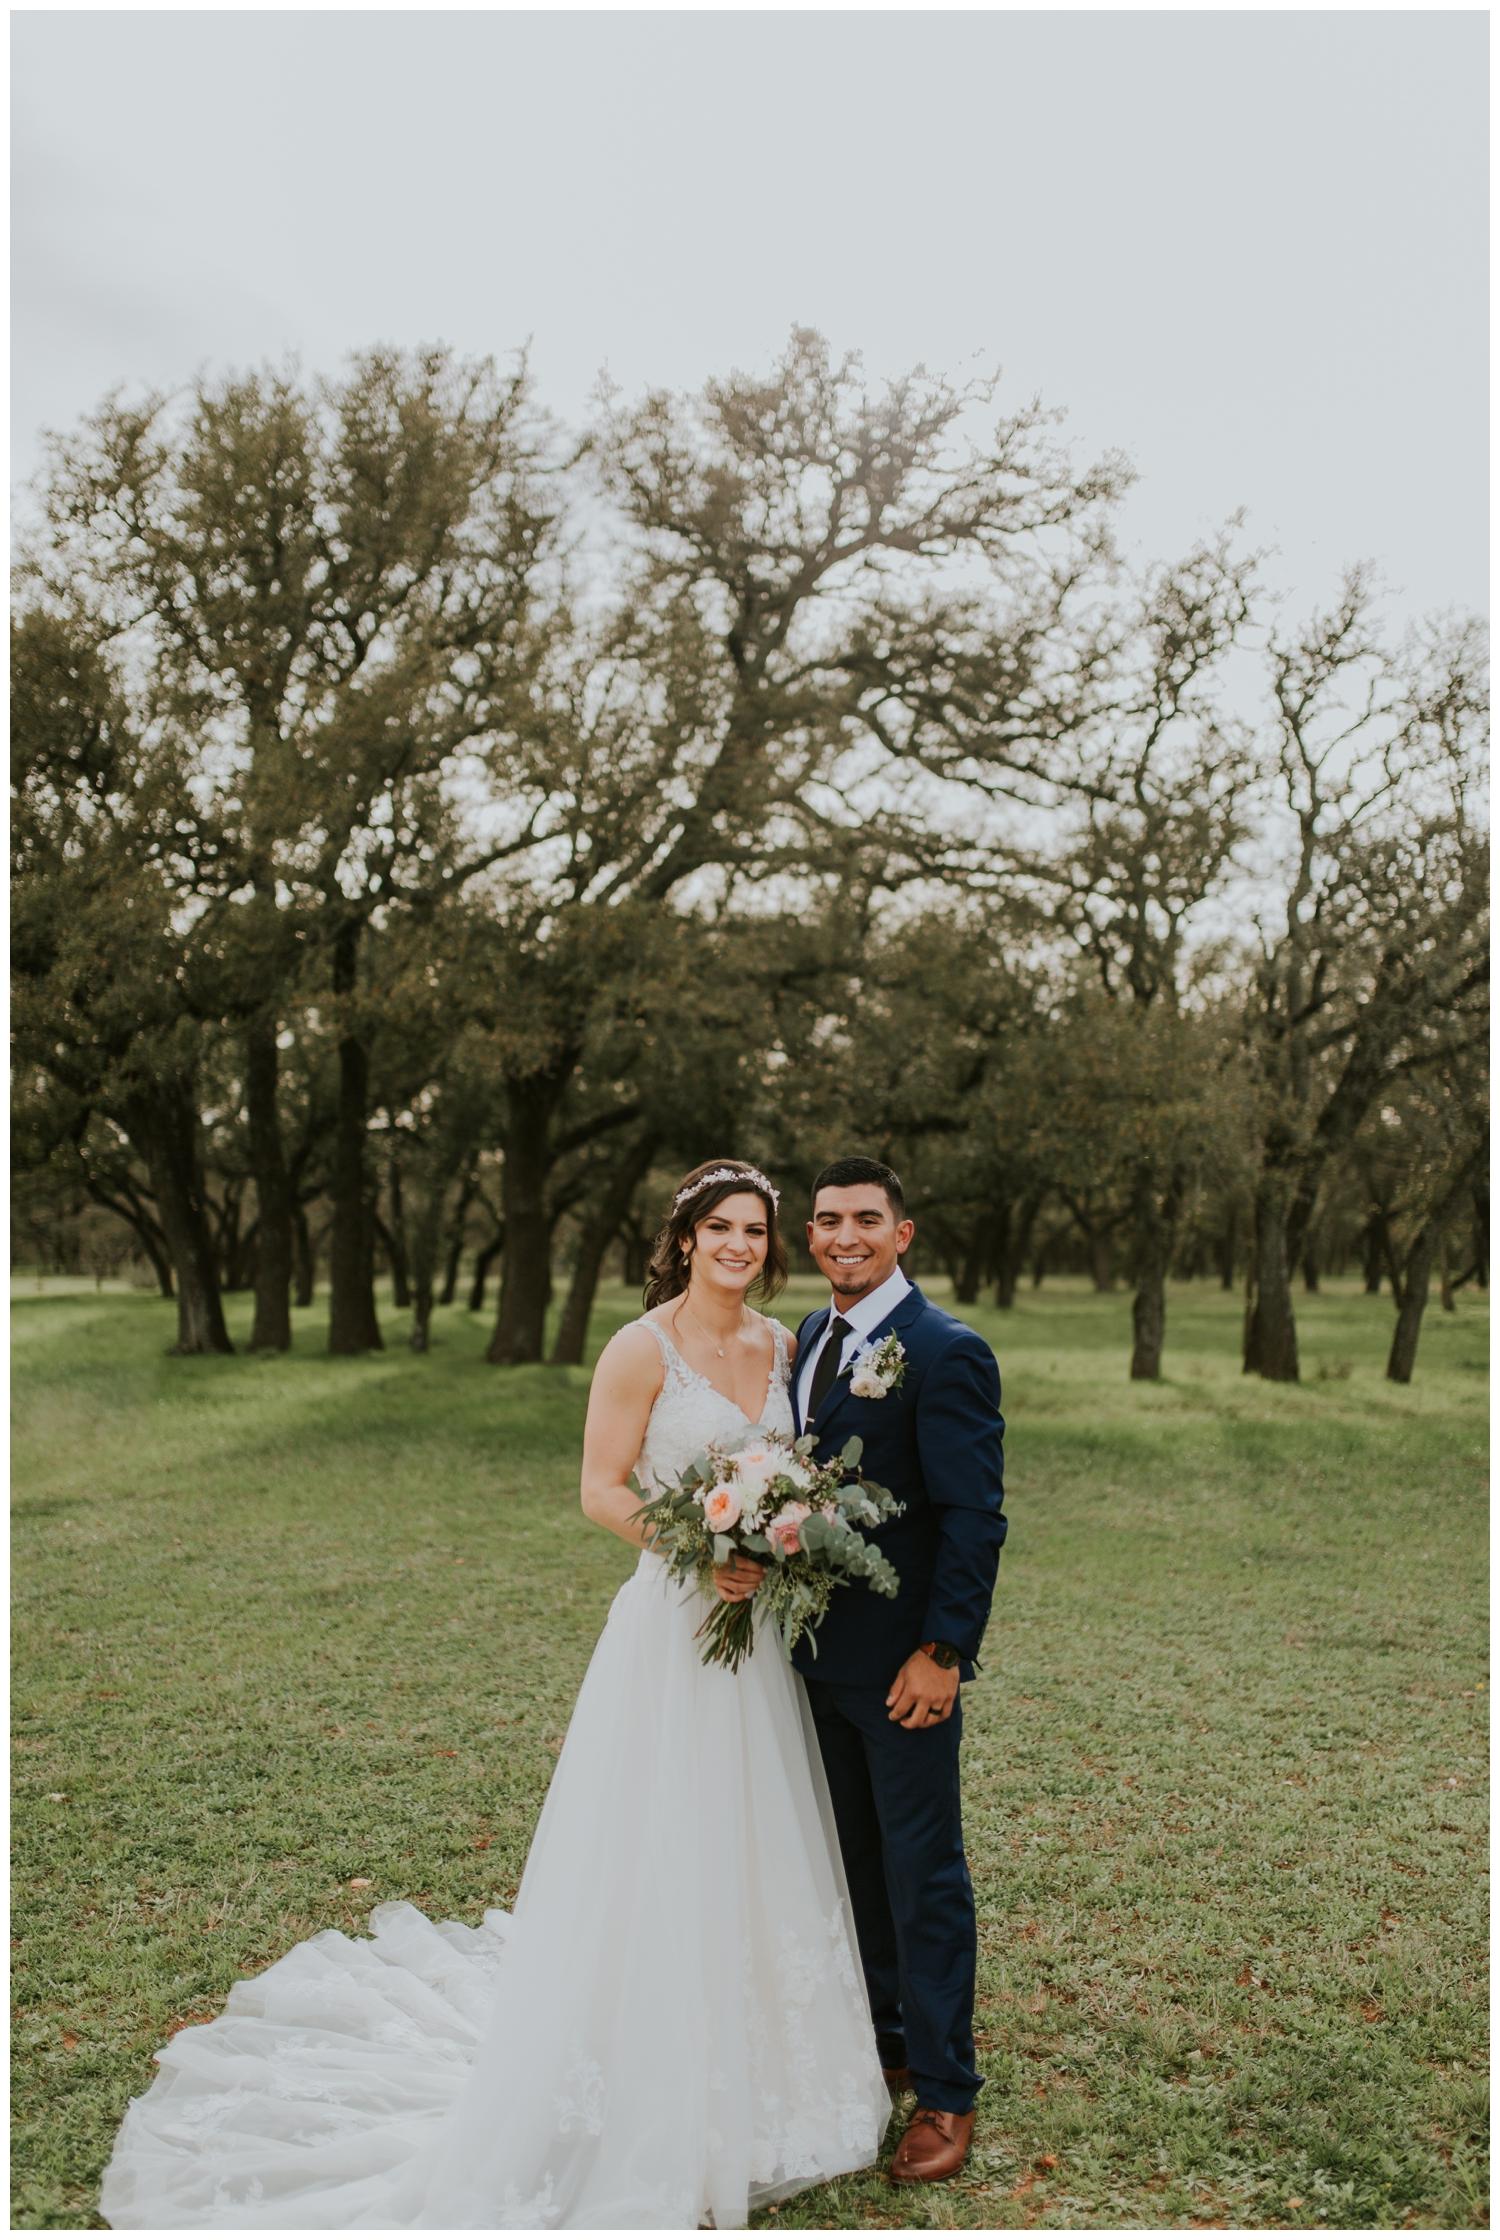 Ashlee+Mike, Featherstone Ranch Spring Wedding, San Antonio, Contista Productions Wedding Photography_0010.jpg